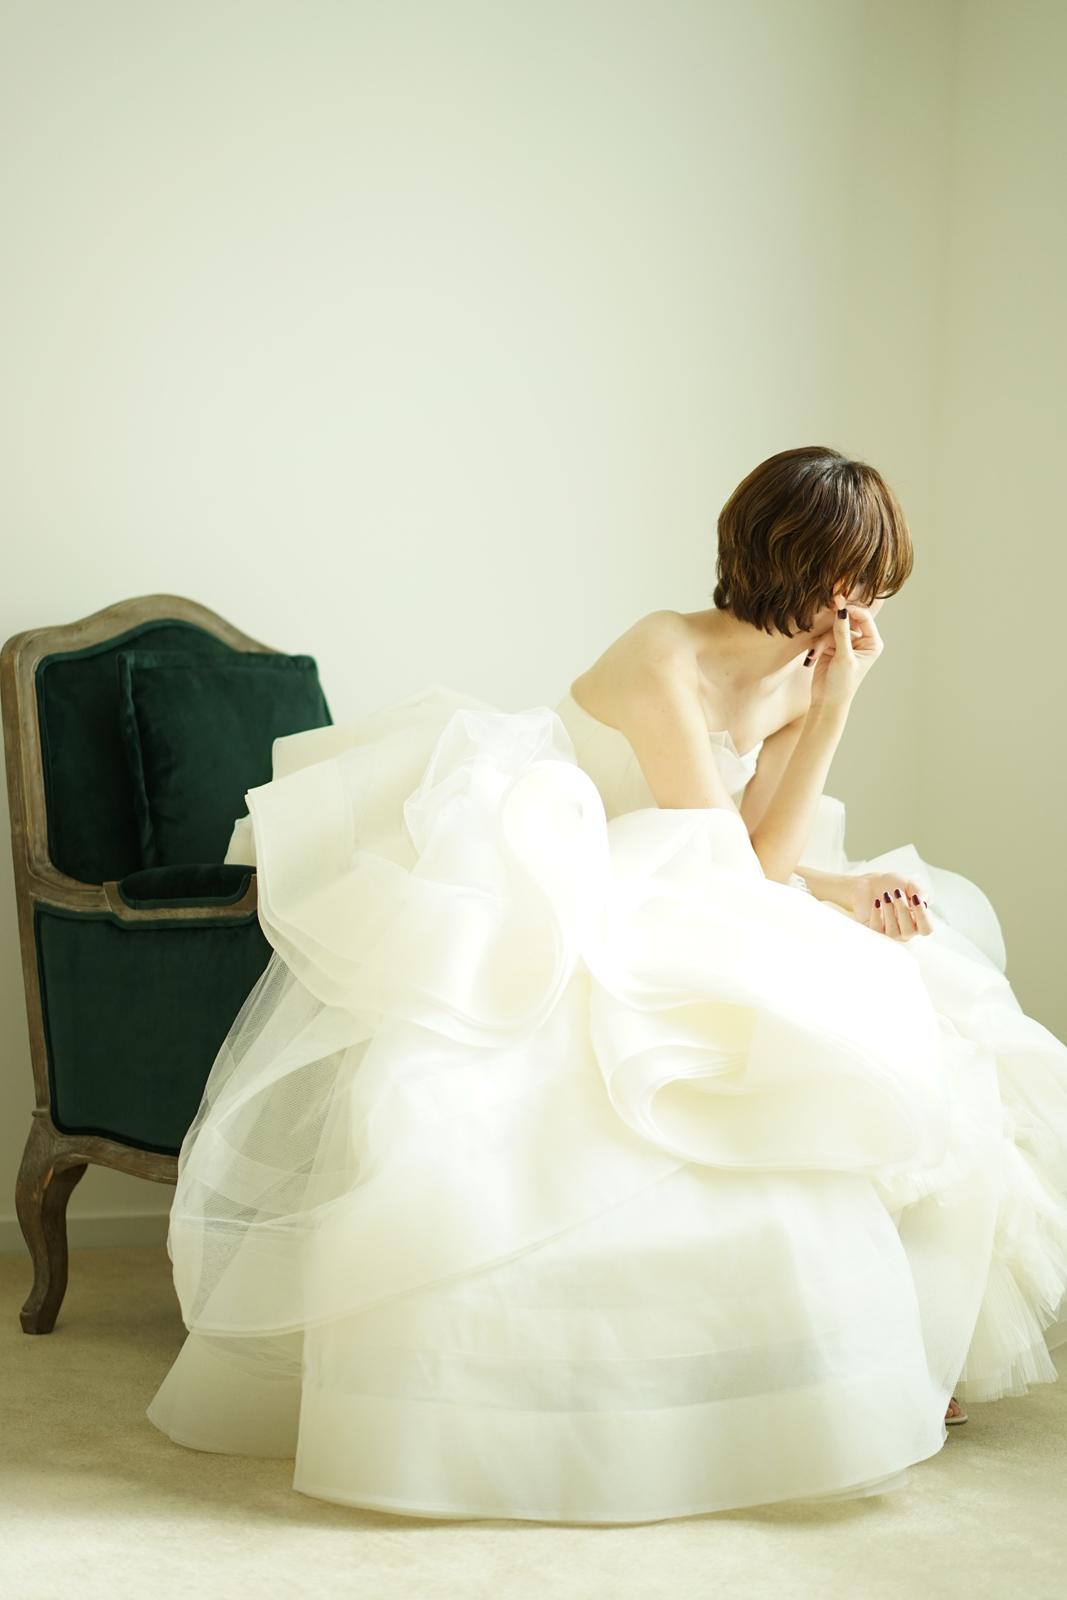 VERA WANG(ヴェラウォン)Katherine(キャサリン)の委託販売、東京広尾ショールーム試着